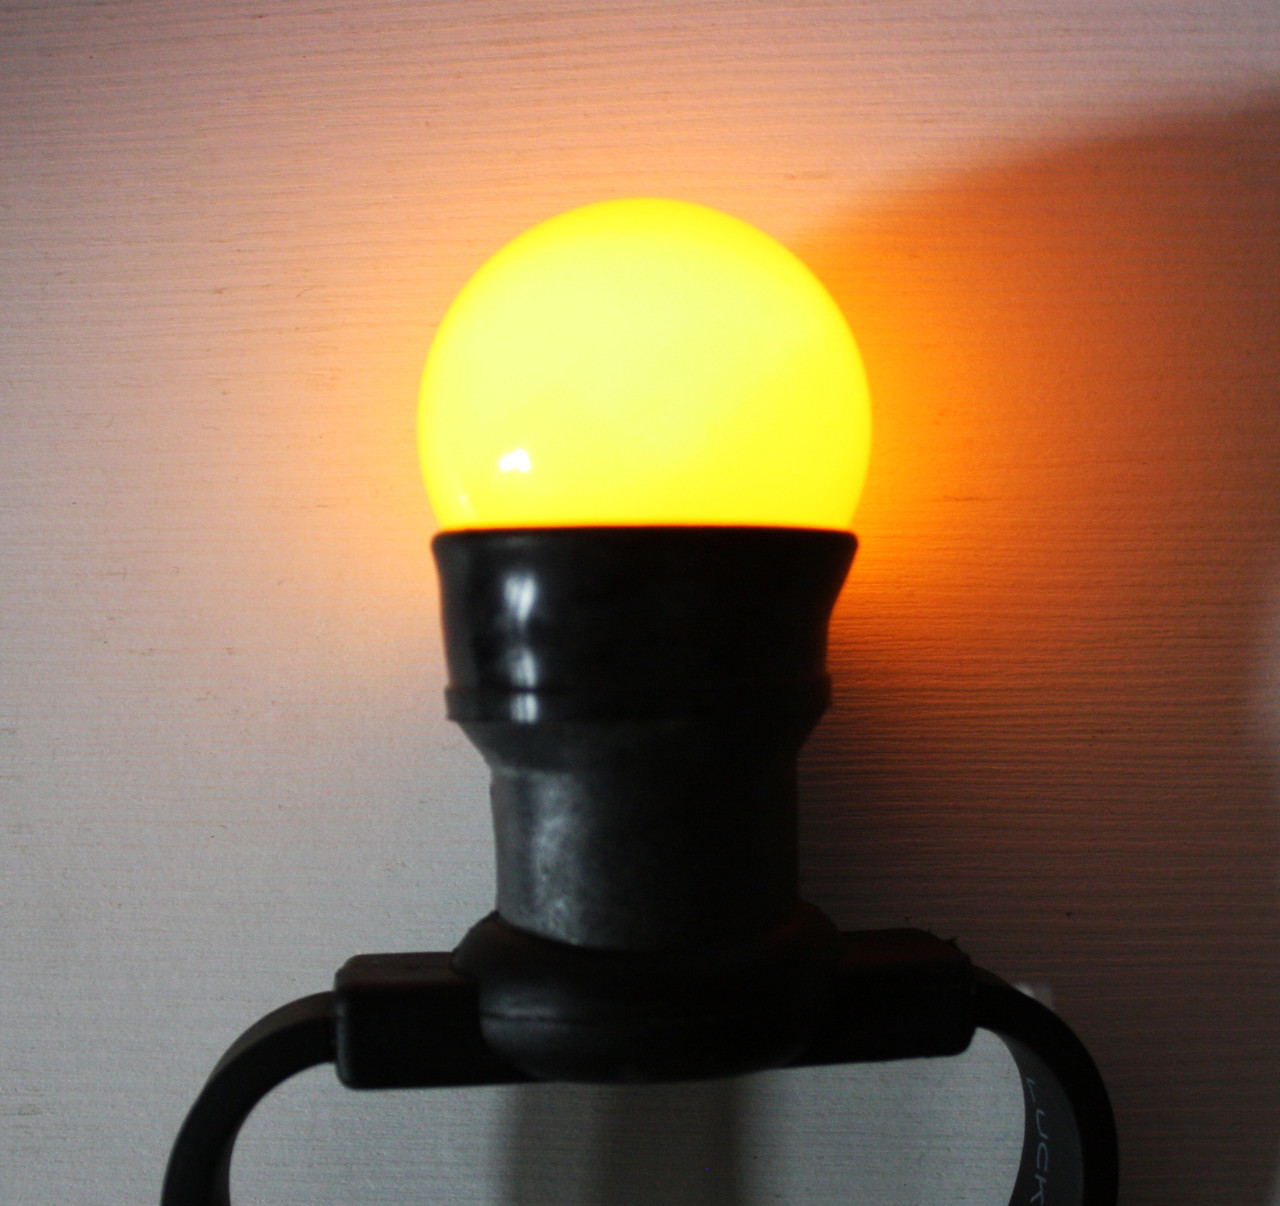 Уличная лампа для гирлянды Lumion Belt Light String (Белт лайт стринг) наружная цвет желтый